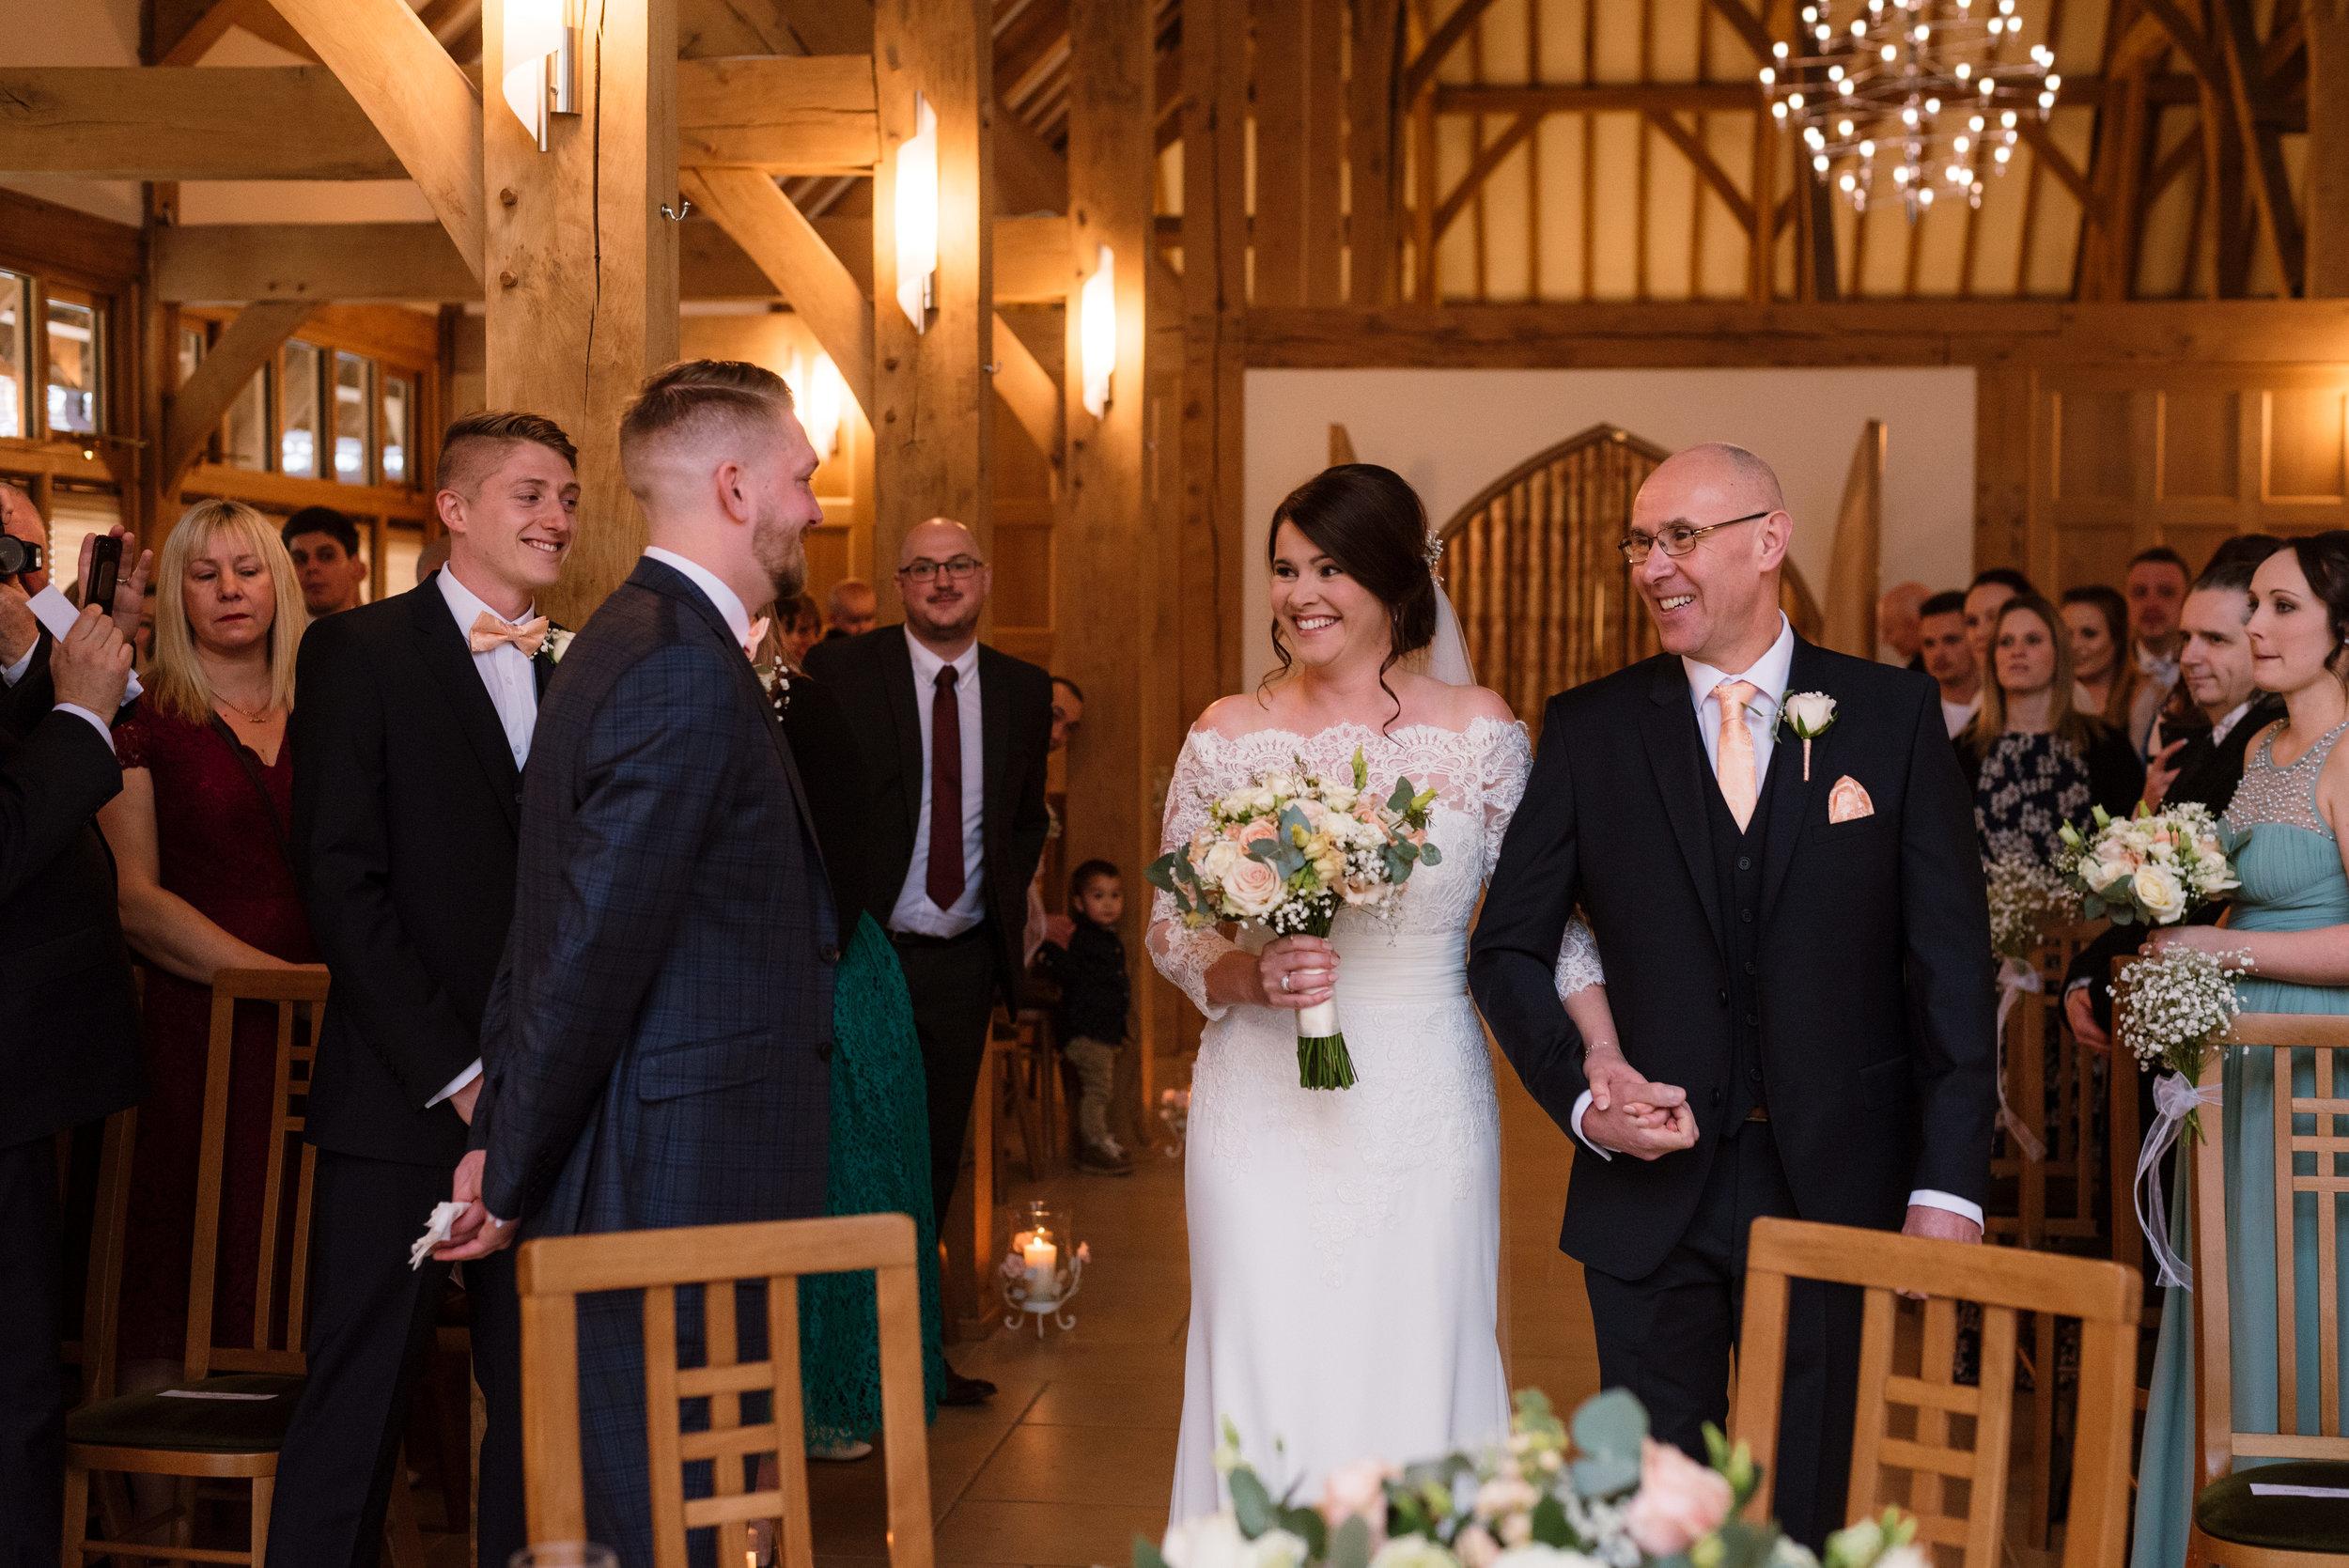 Sarah-Fishlock-Photography-Hampshire-wedding-photographer-hampshire / fleet-wedding-photographer-fleet / rivervale-barn-wedding-photographer / hampshire-barn-wedding-venue / hampshire-wedding-venue / barn-wedding-hampshire / rivervale-barn